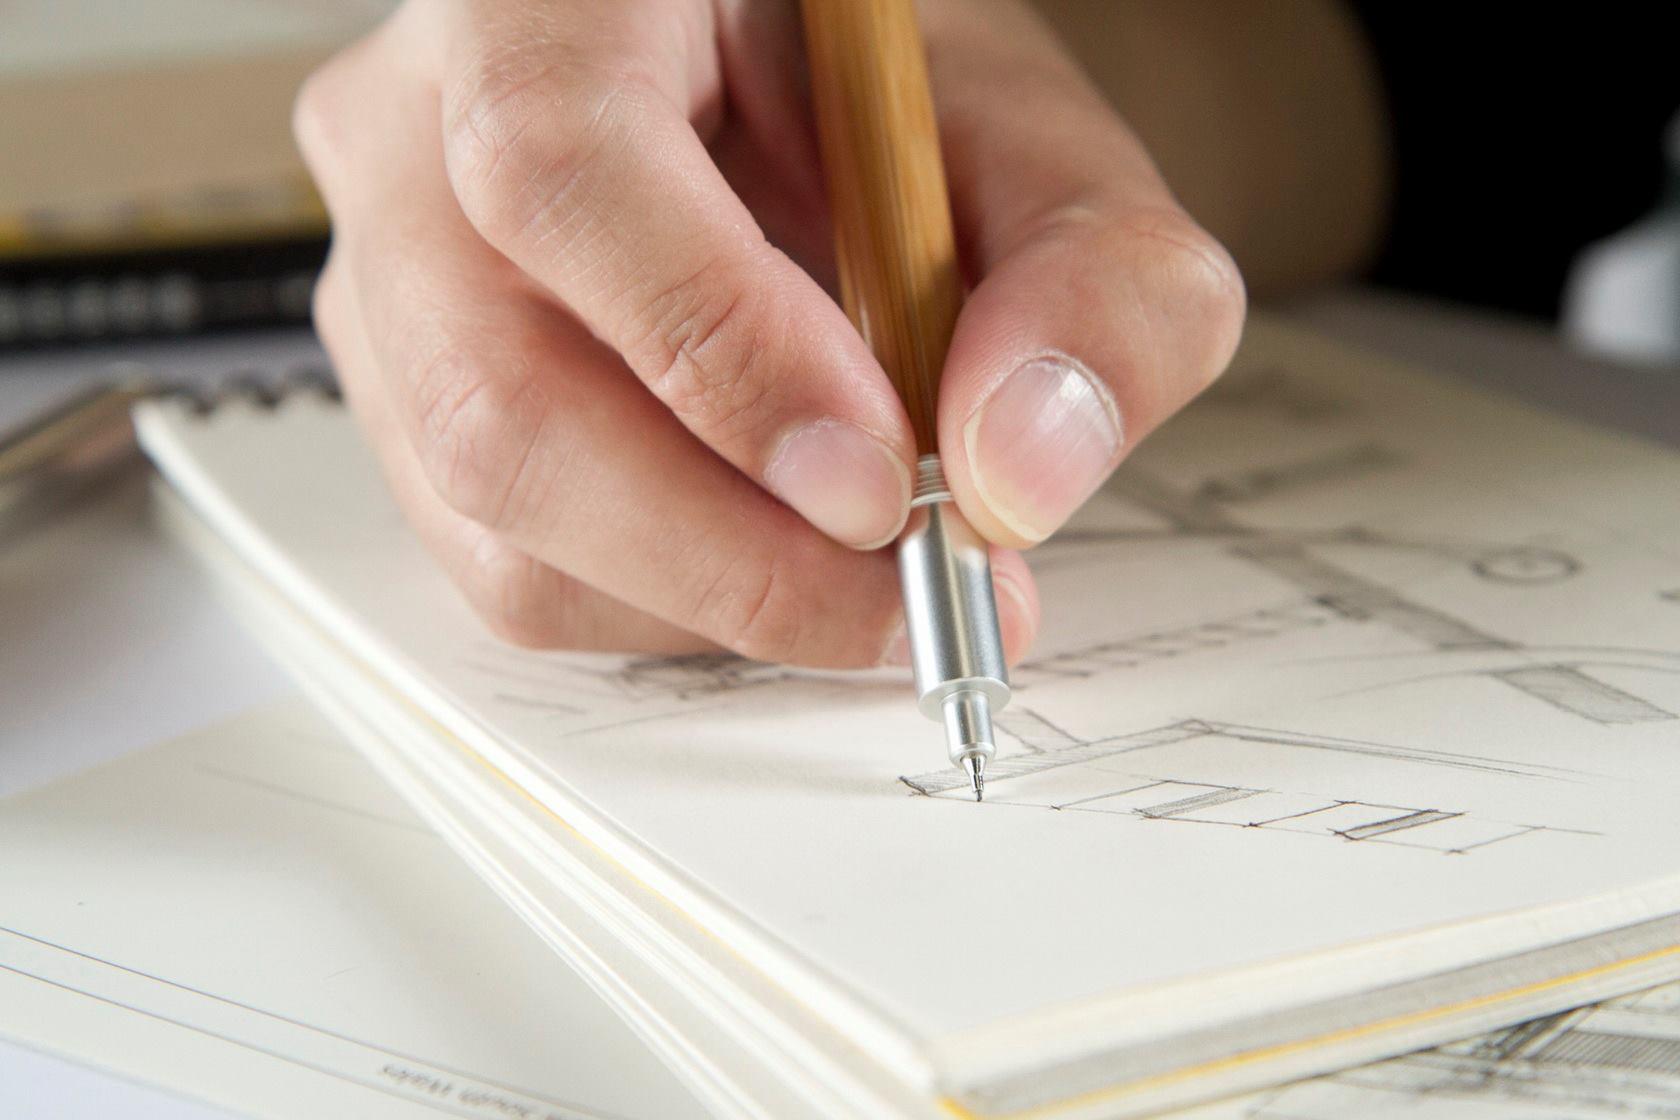 stylus-pen-pencil-isuja2